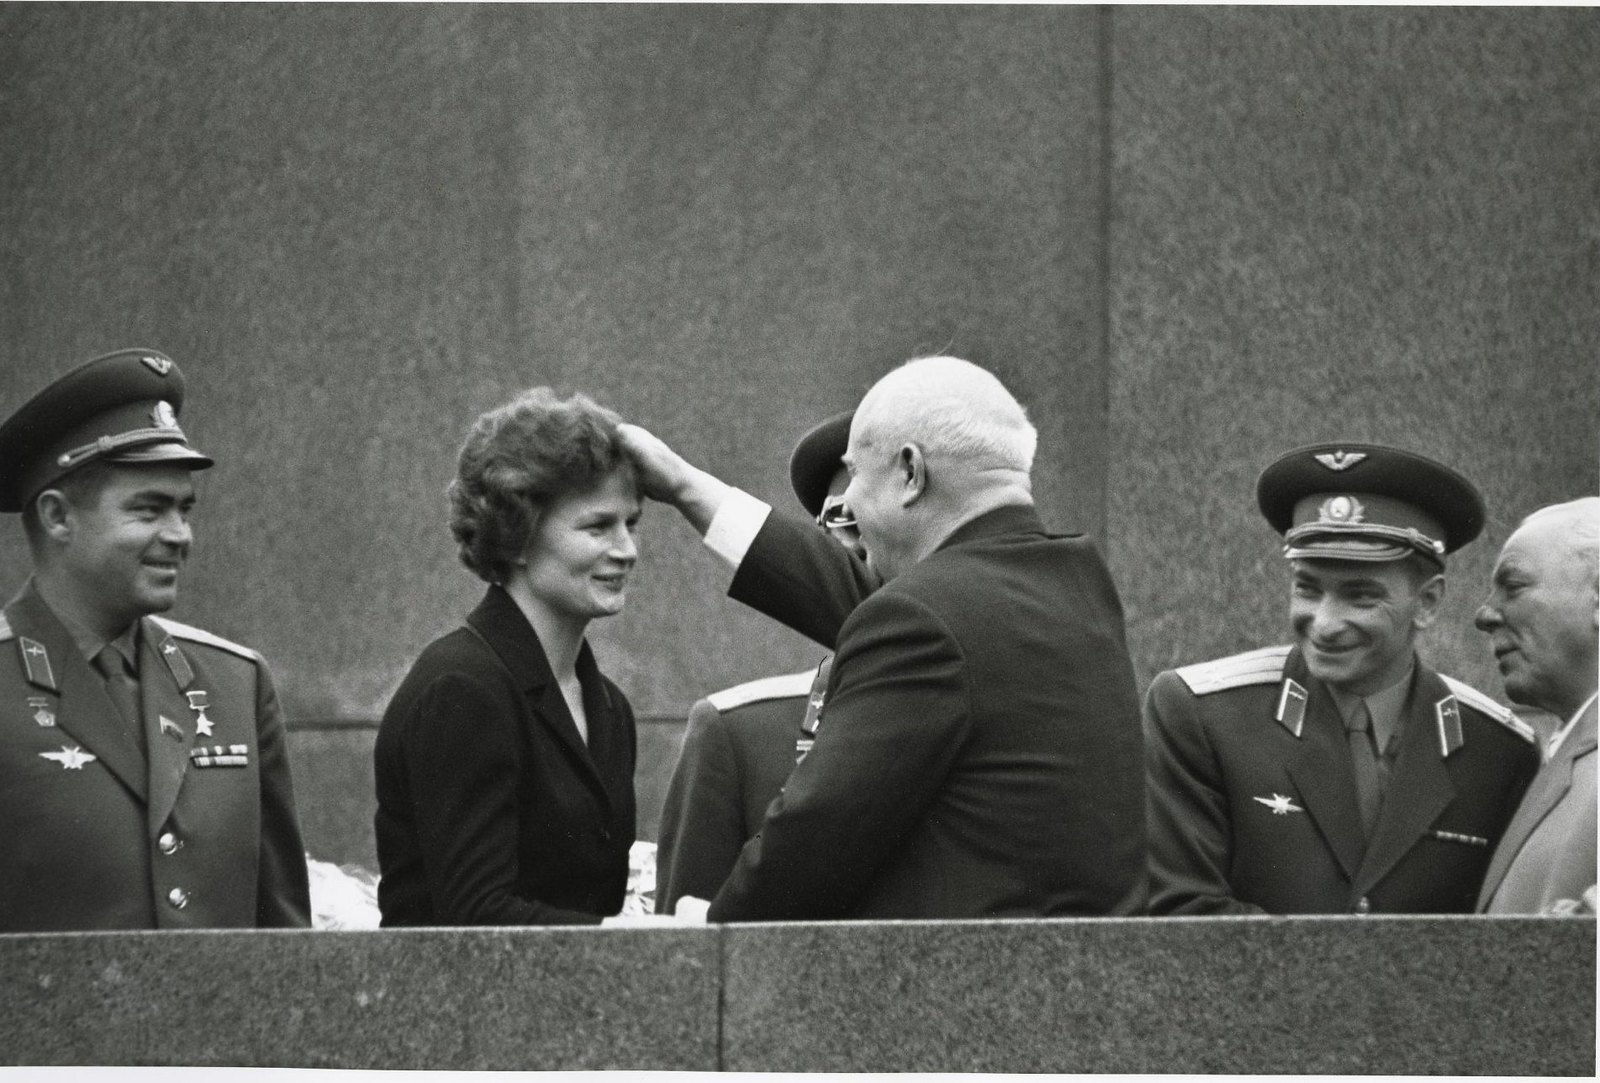 1963. Андриян Николаев, Валентина Терешкова, Никита Хрущев и Валерий Быковский на Красной площади